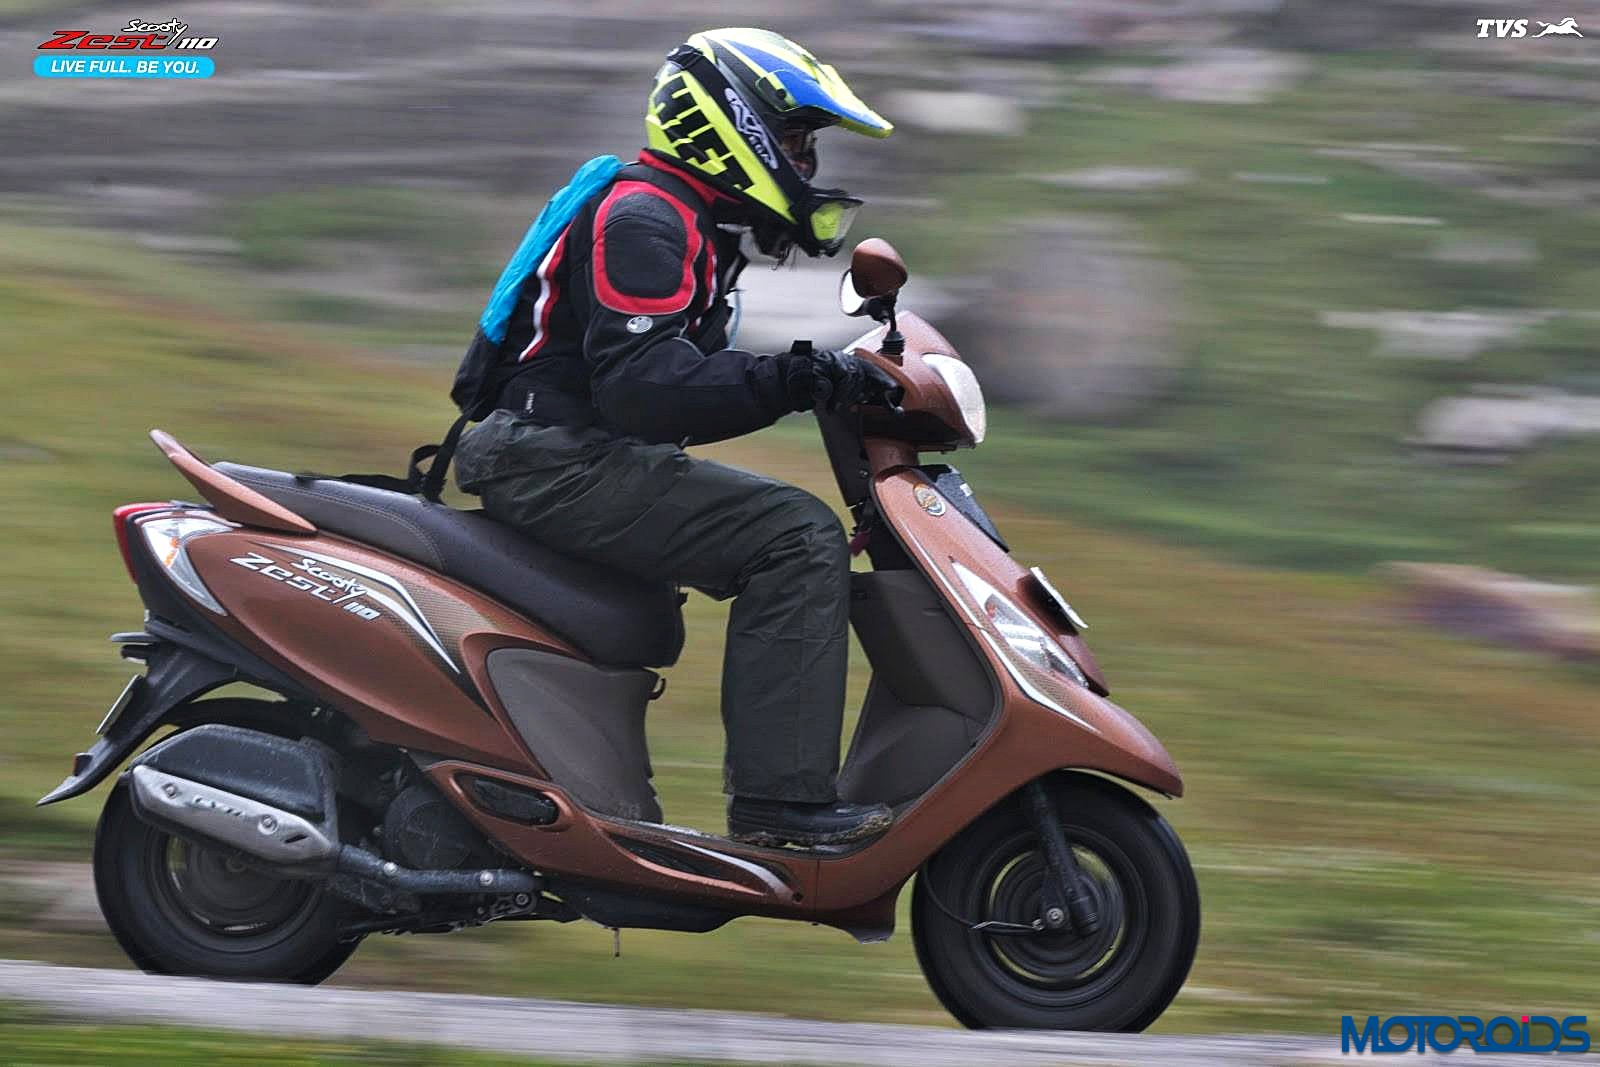 tvs-scooty-zest-how-to-buy-riding-gear-2